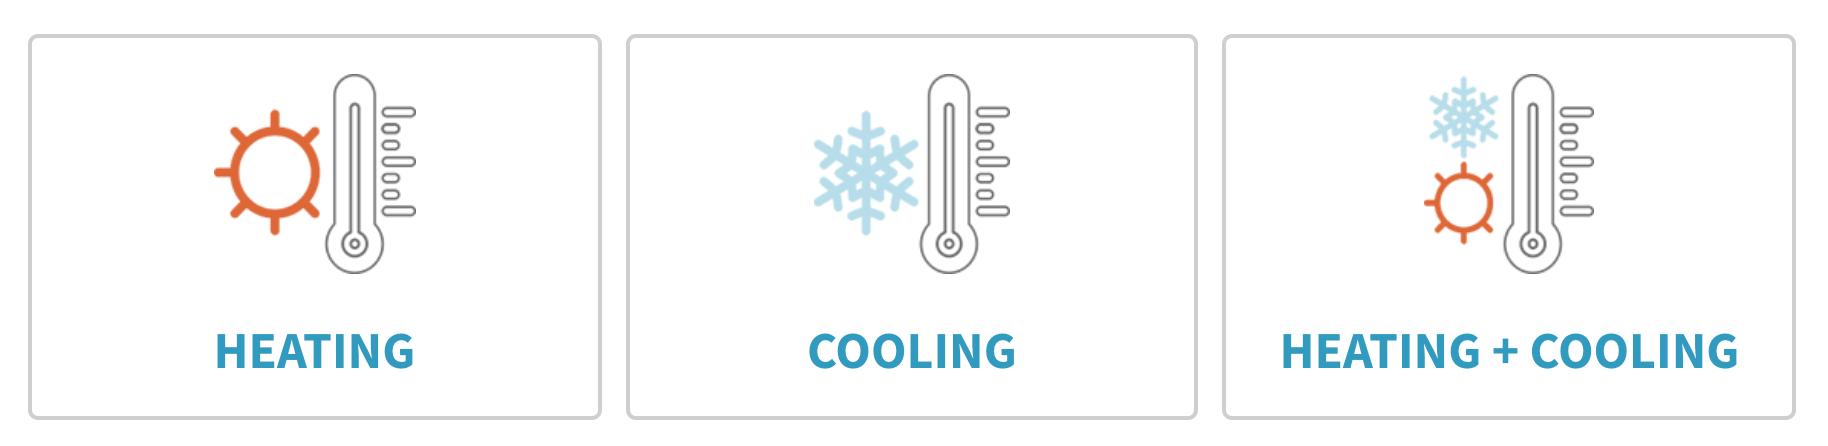 type of HVAC system